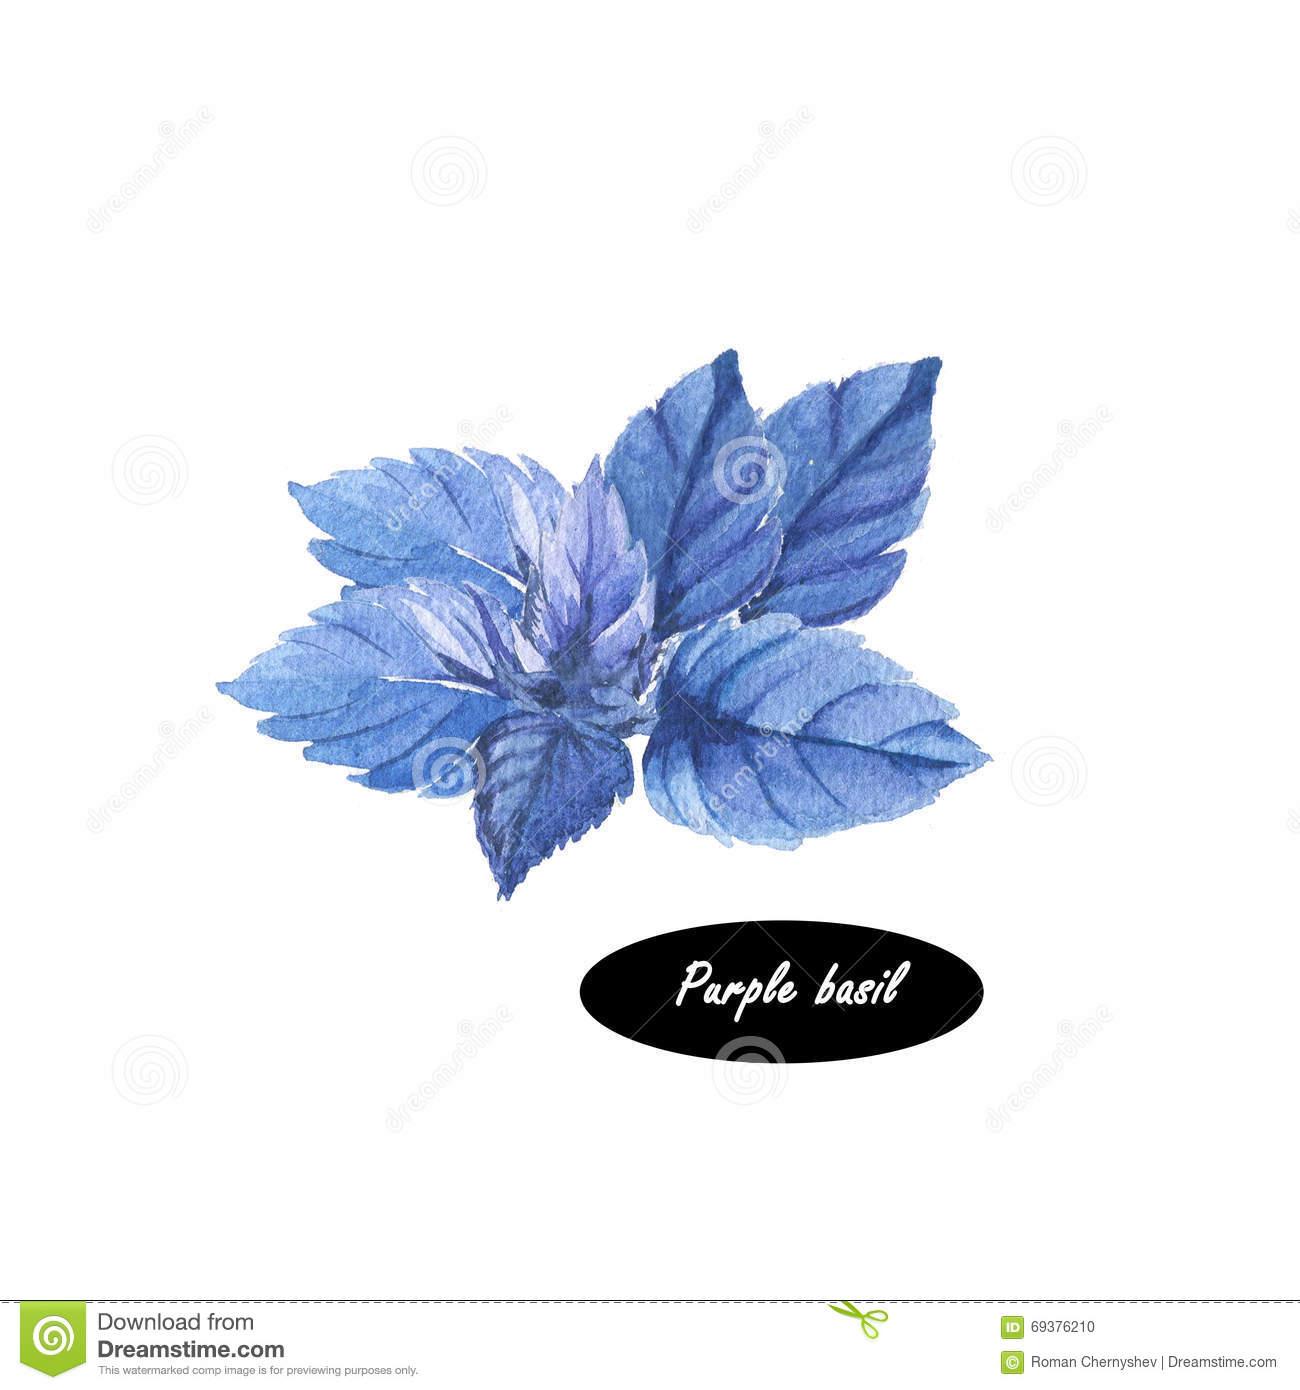 Basil Herb Spice Leaf On White Background Stock Illustration.